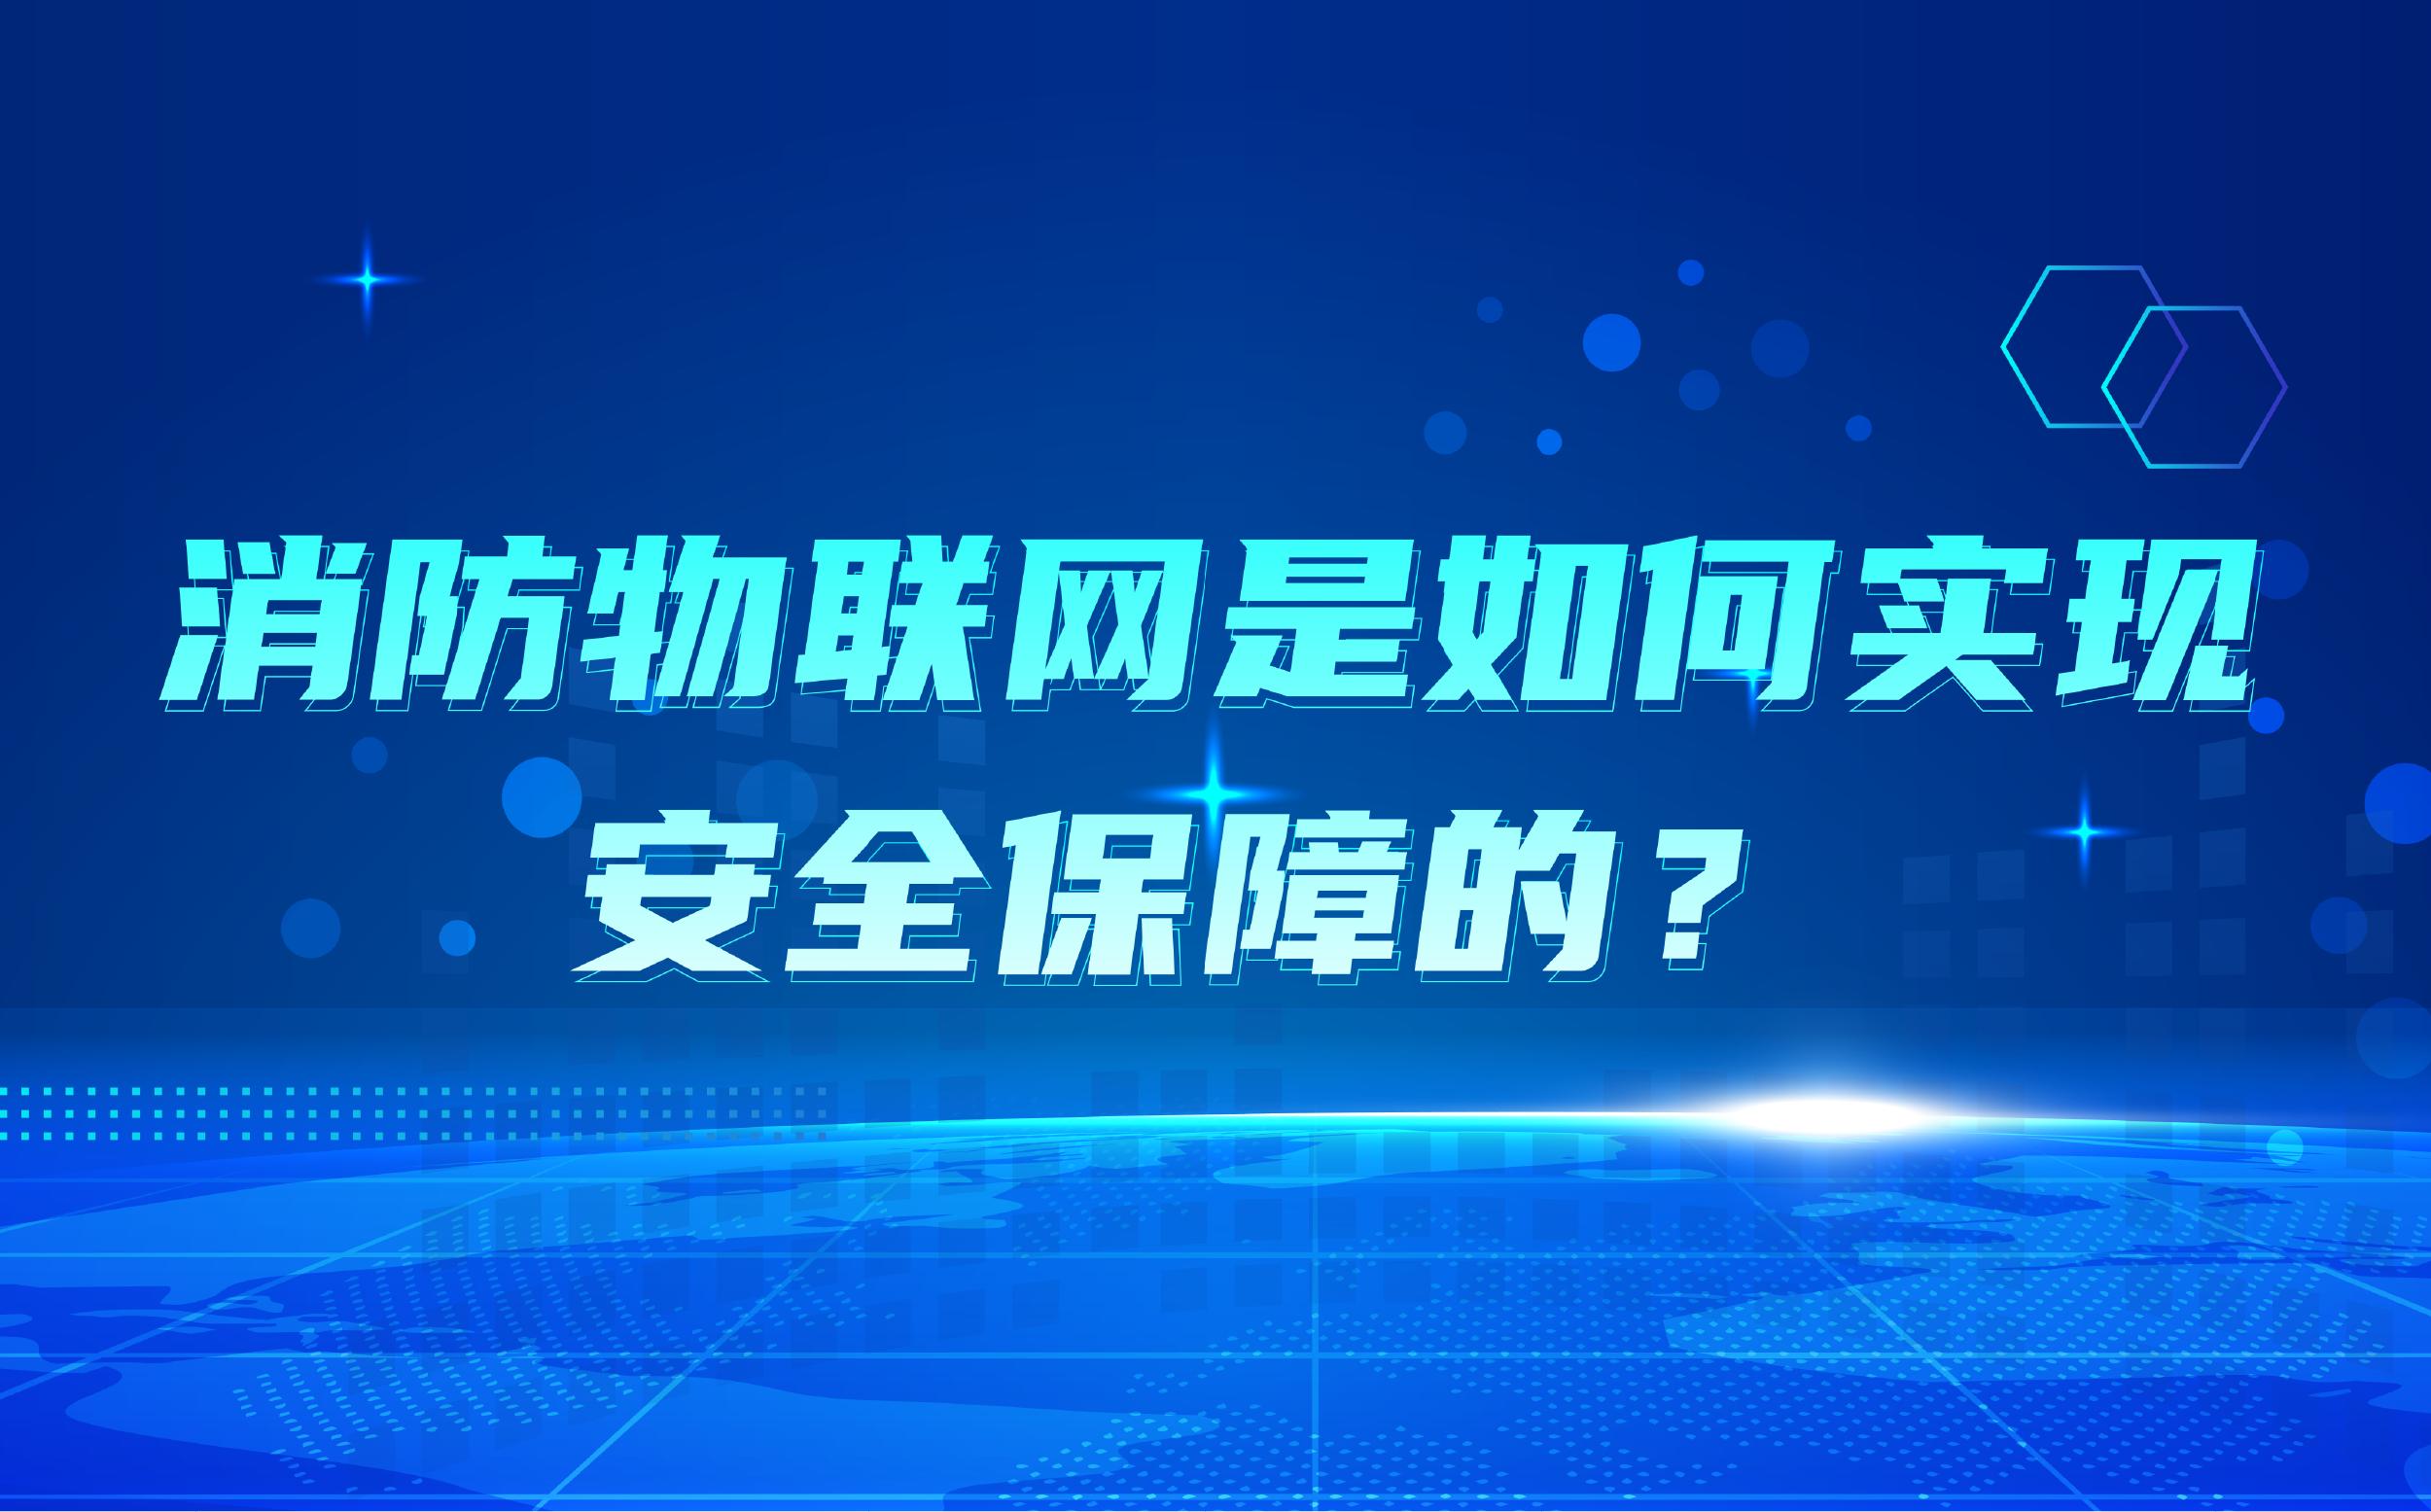 https://timcloud.oss-cn-shanghai.aliyuncs.com/file/iot4/picture/2021/4/9/1617959049963.png